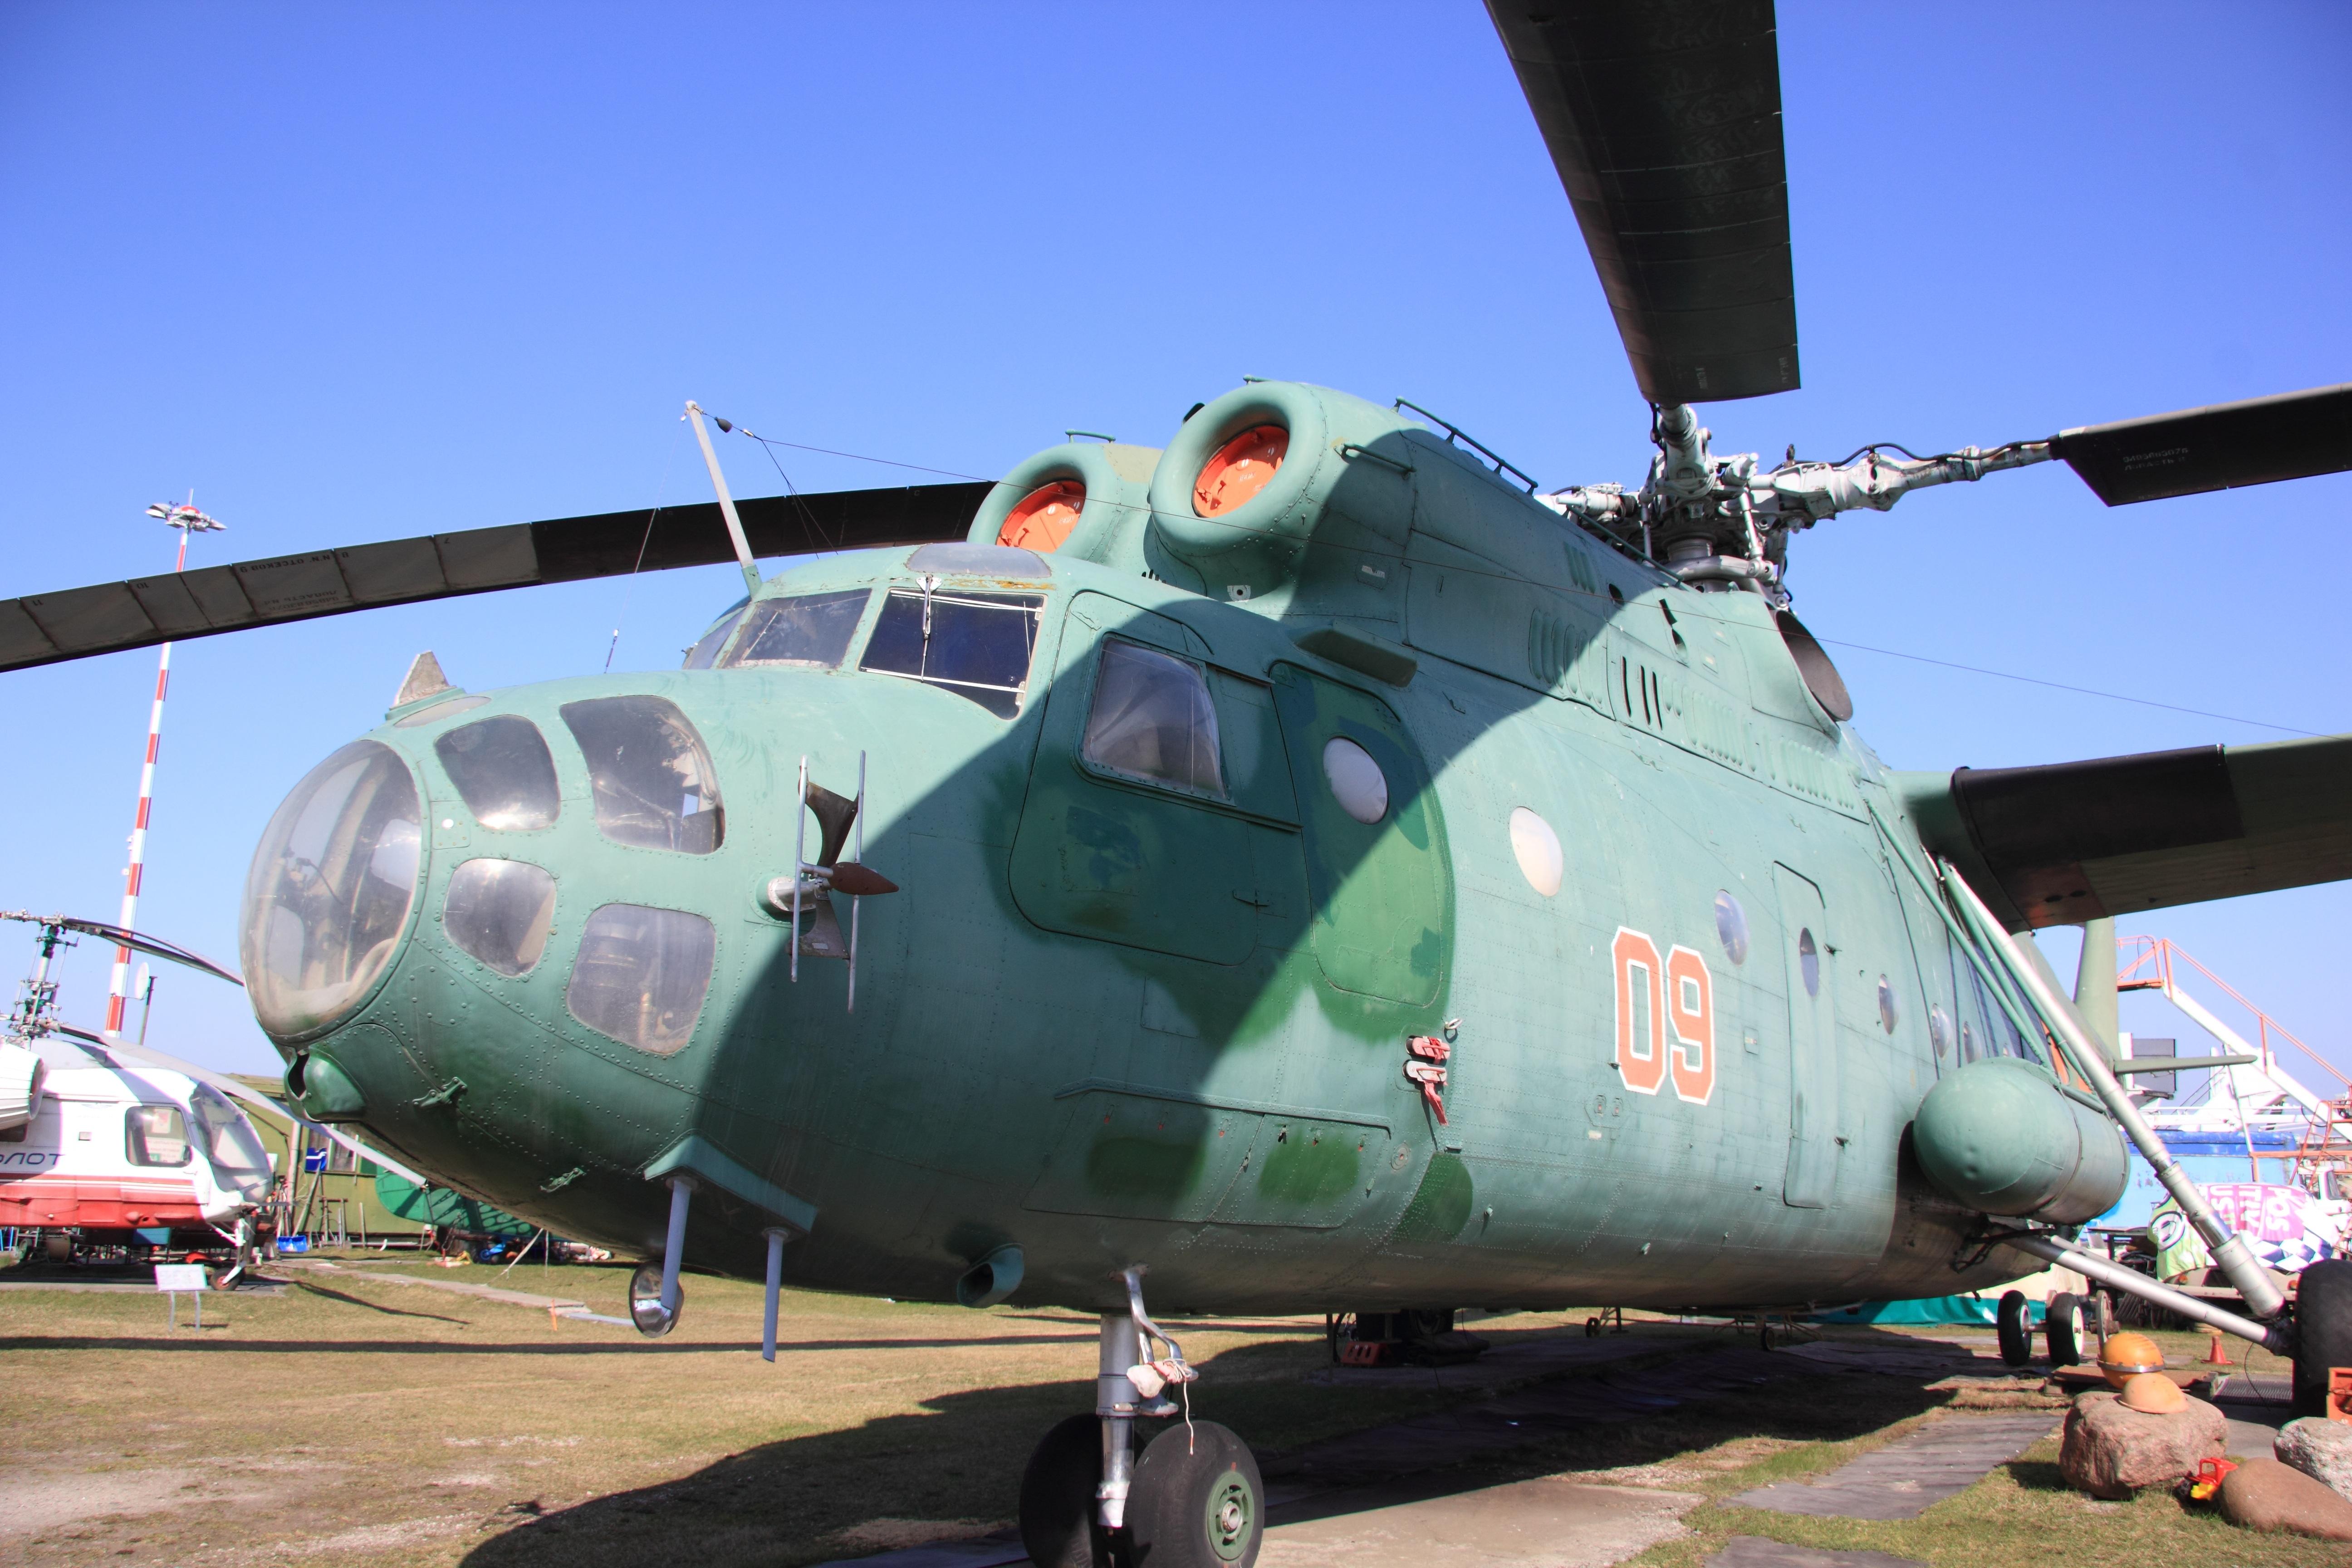 Gambar Pesawat Terbang Kendaraan Museum Penerbangan Rusia Uni